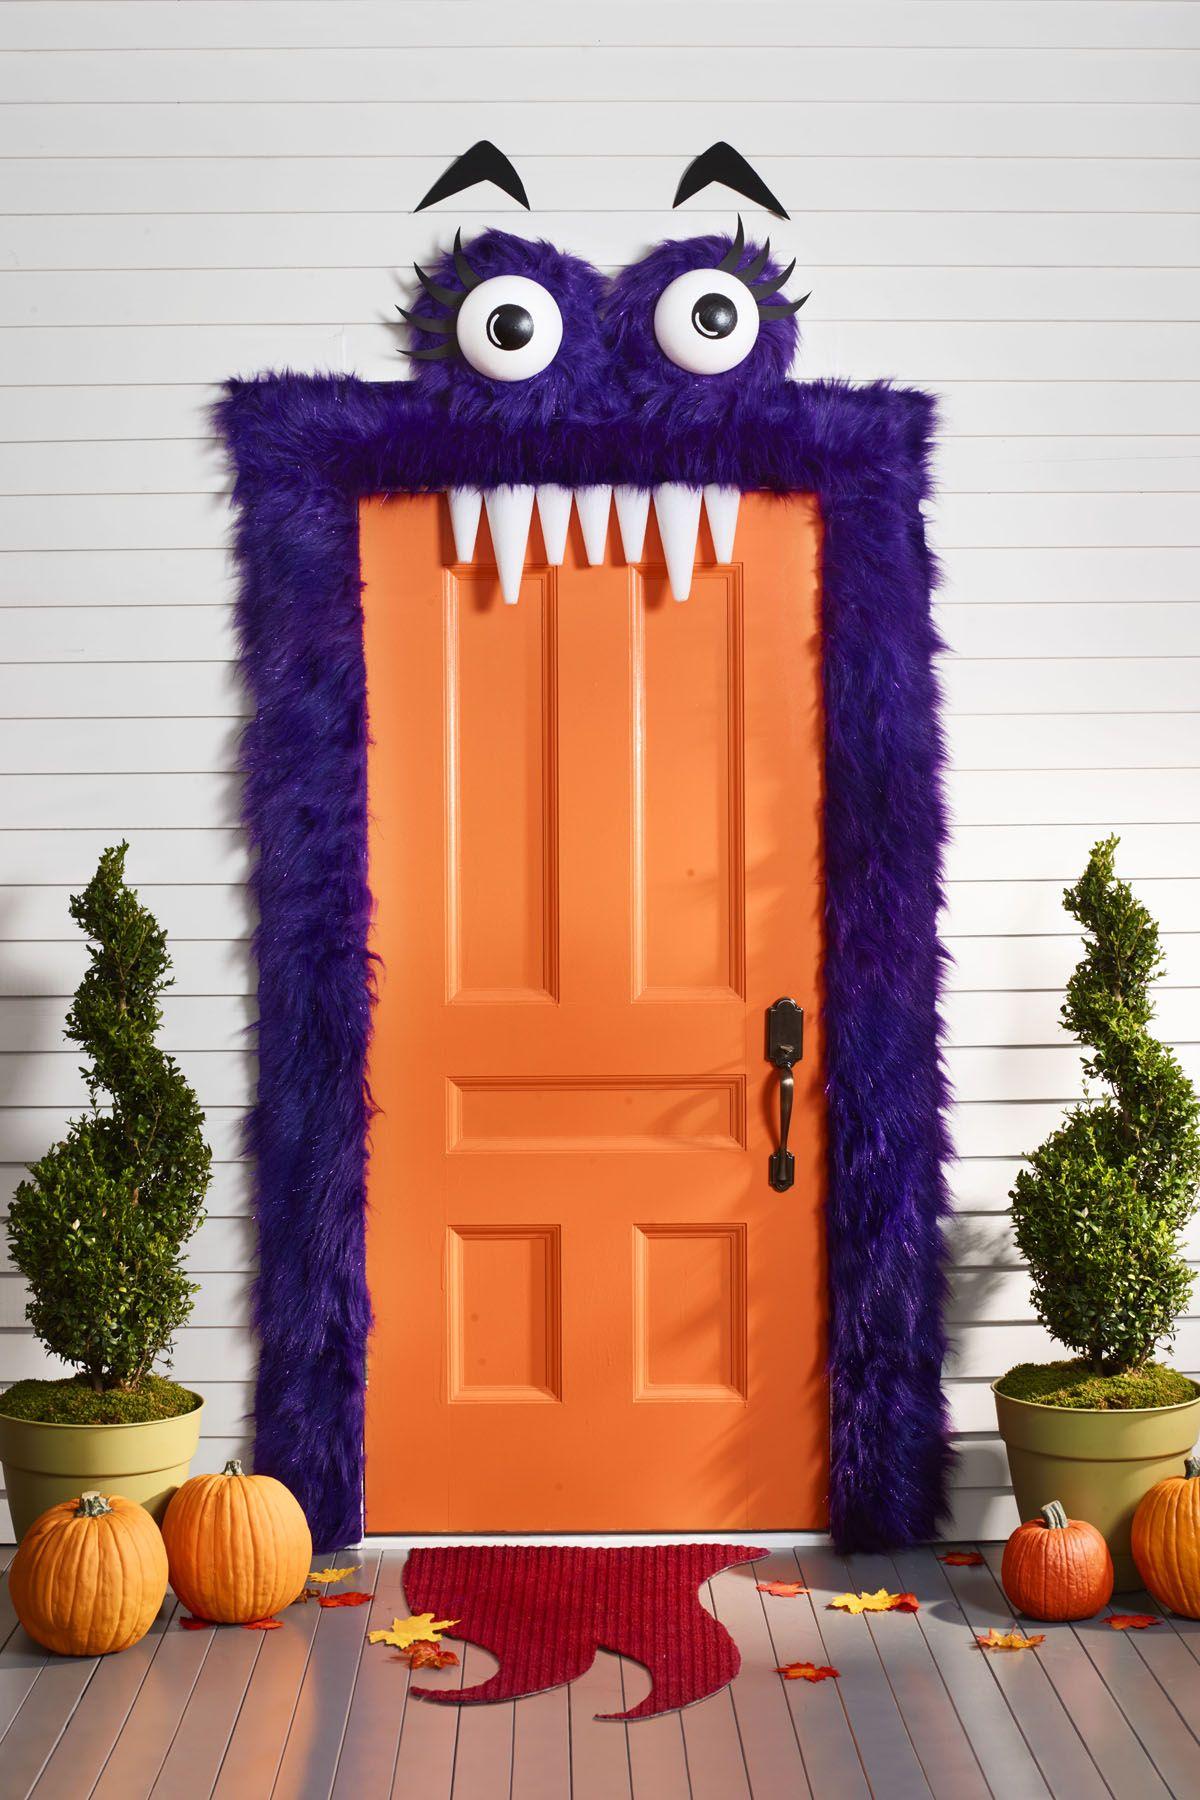 54 Easy Halloween Decorations Spooky Home Decor Ideas